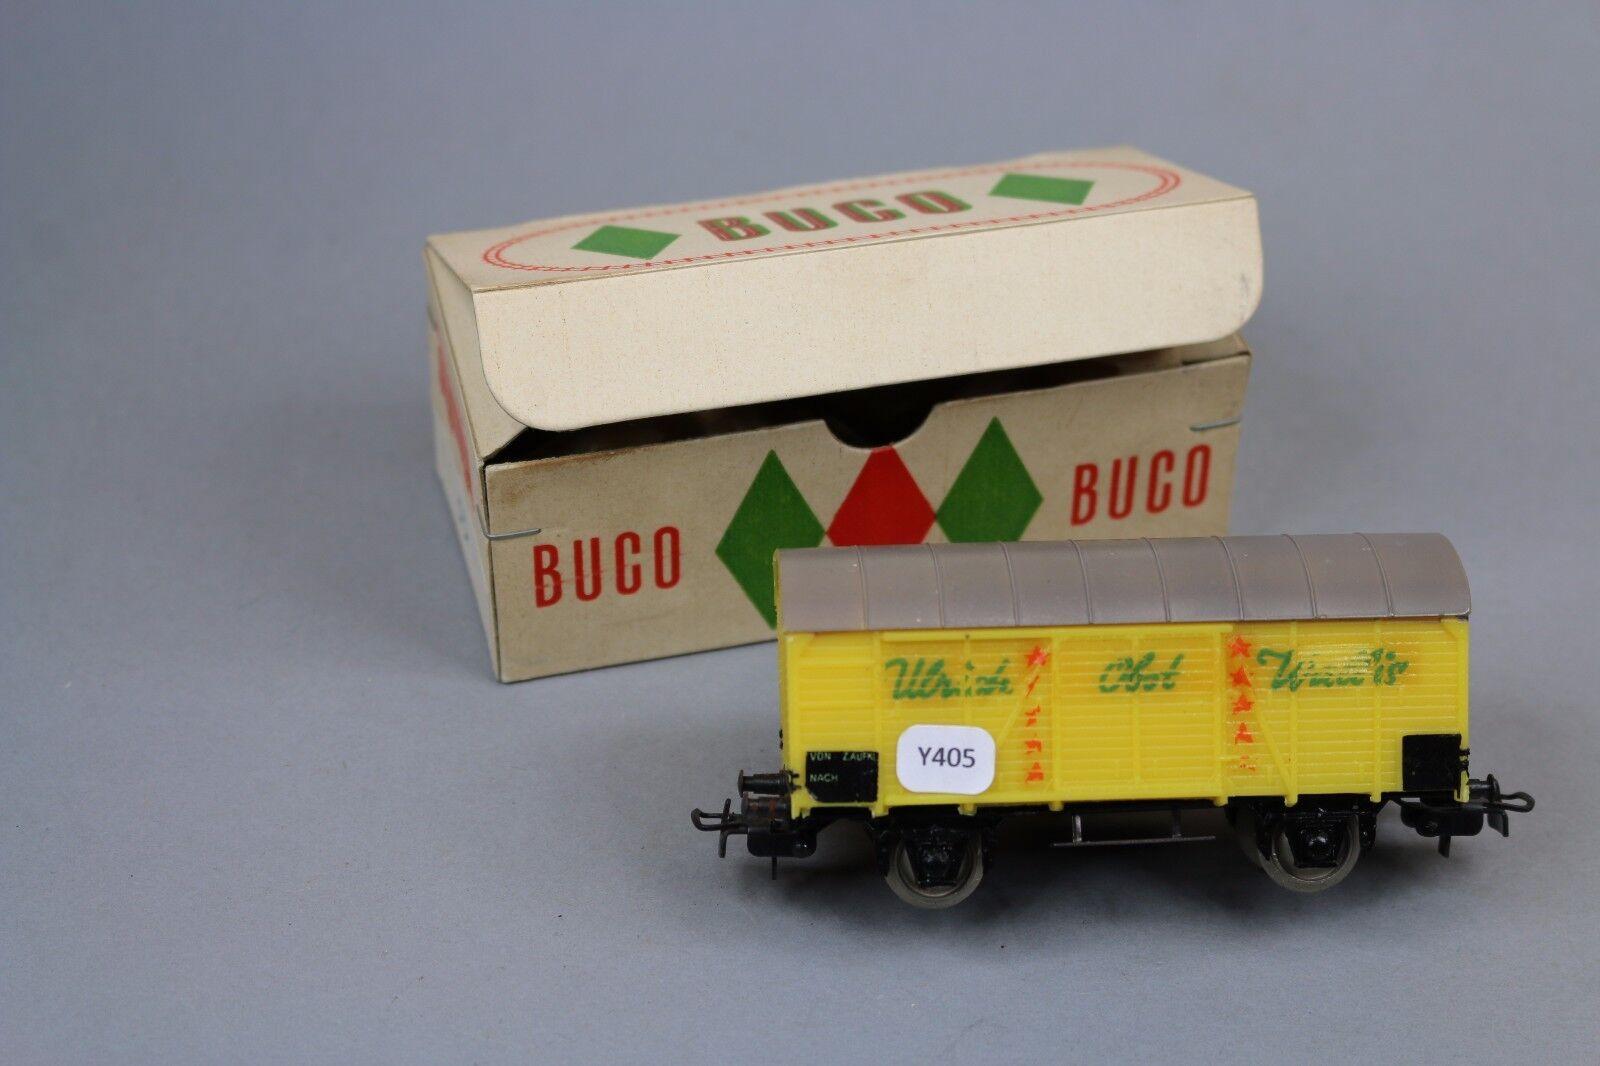 Y405 buco train oh rare boxcar 2 axles ulrich fruit yellow grey valais